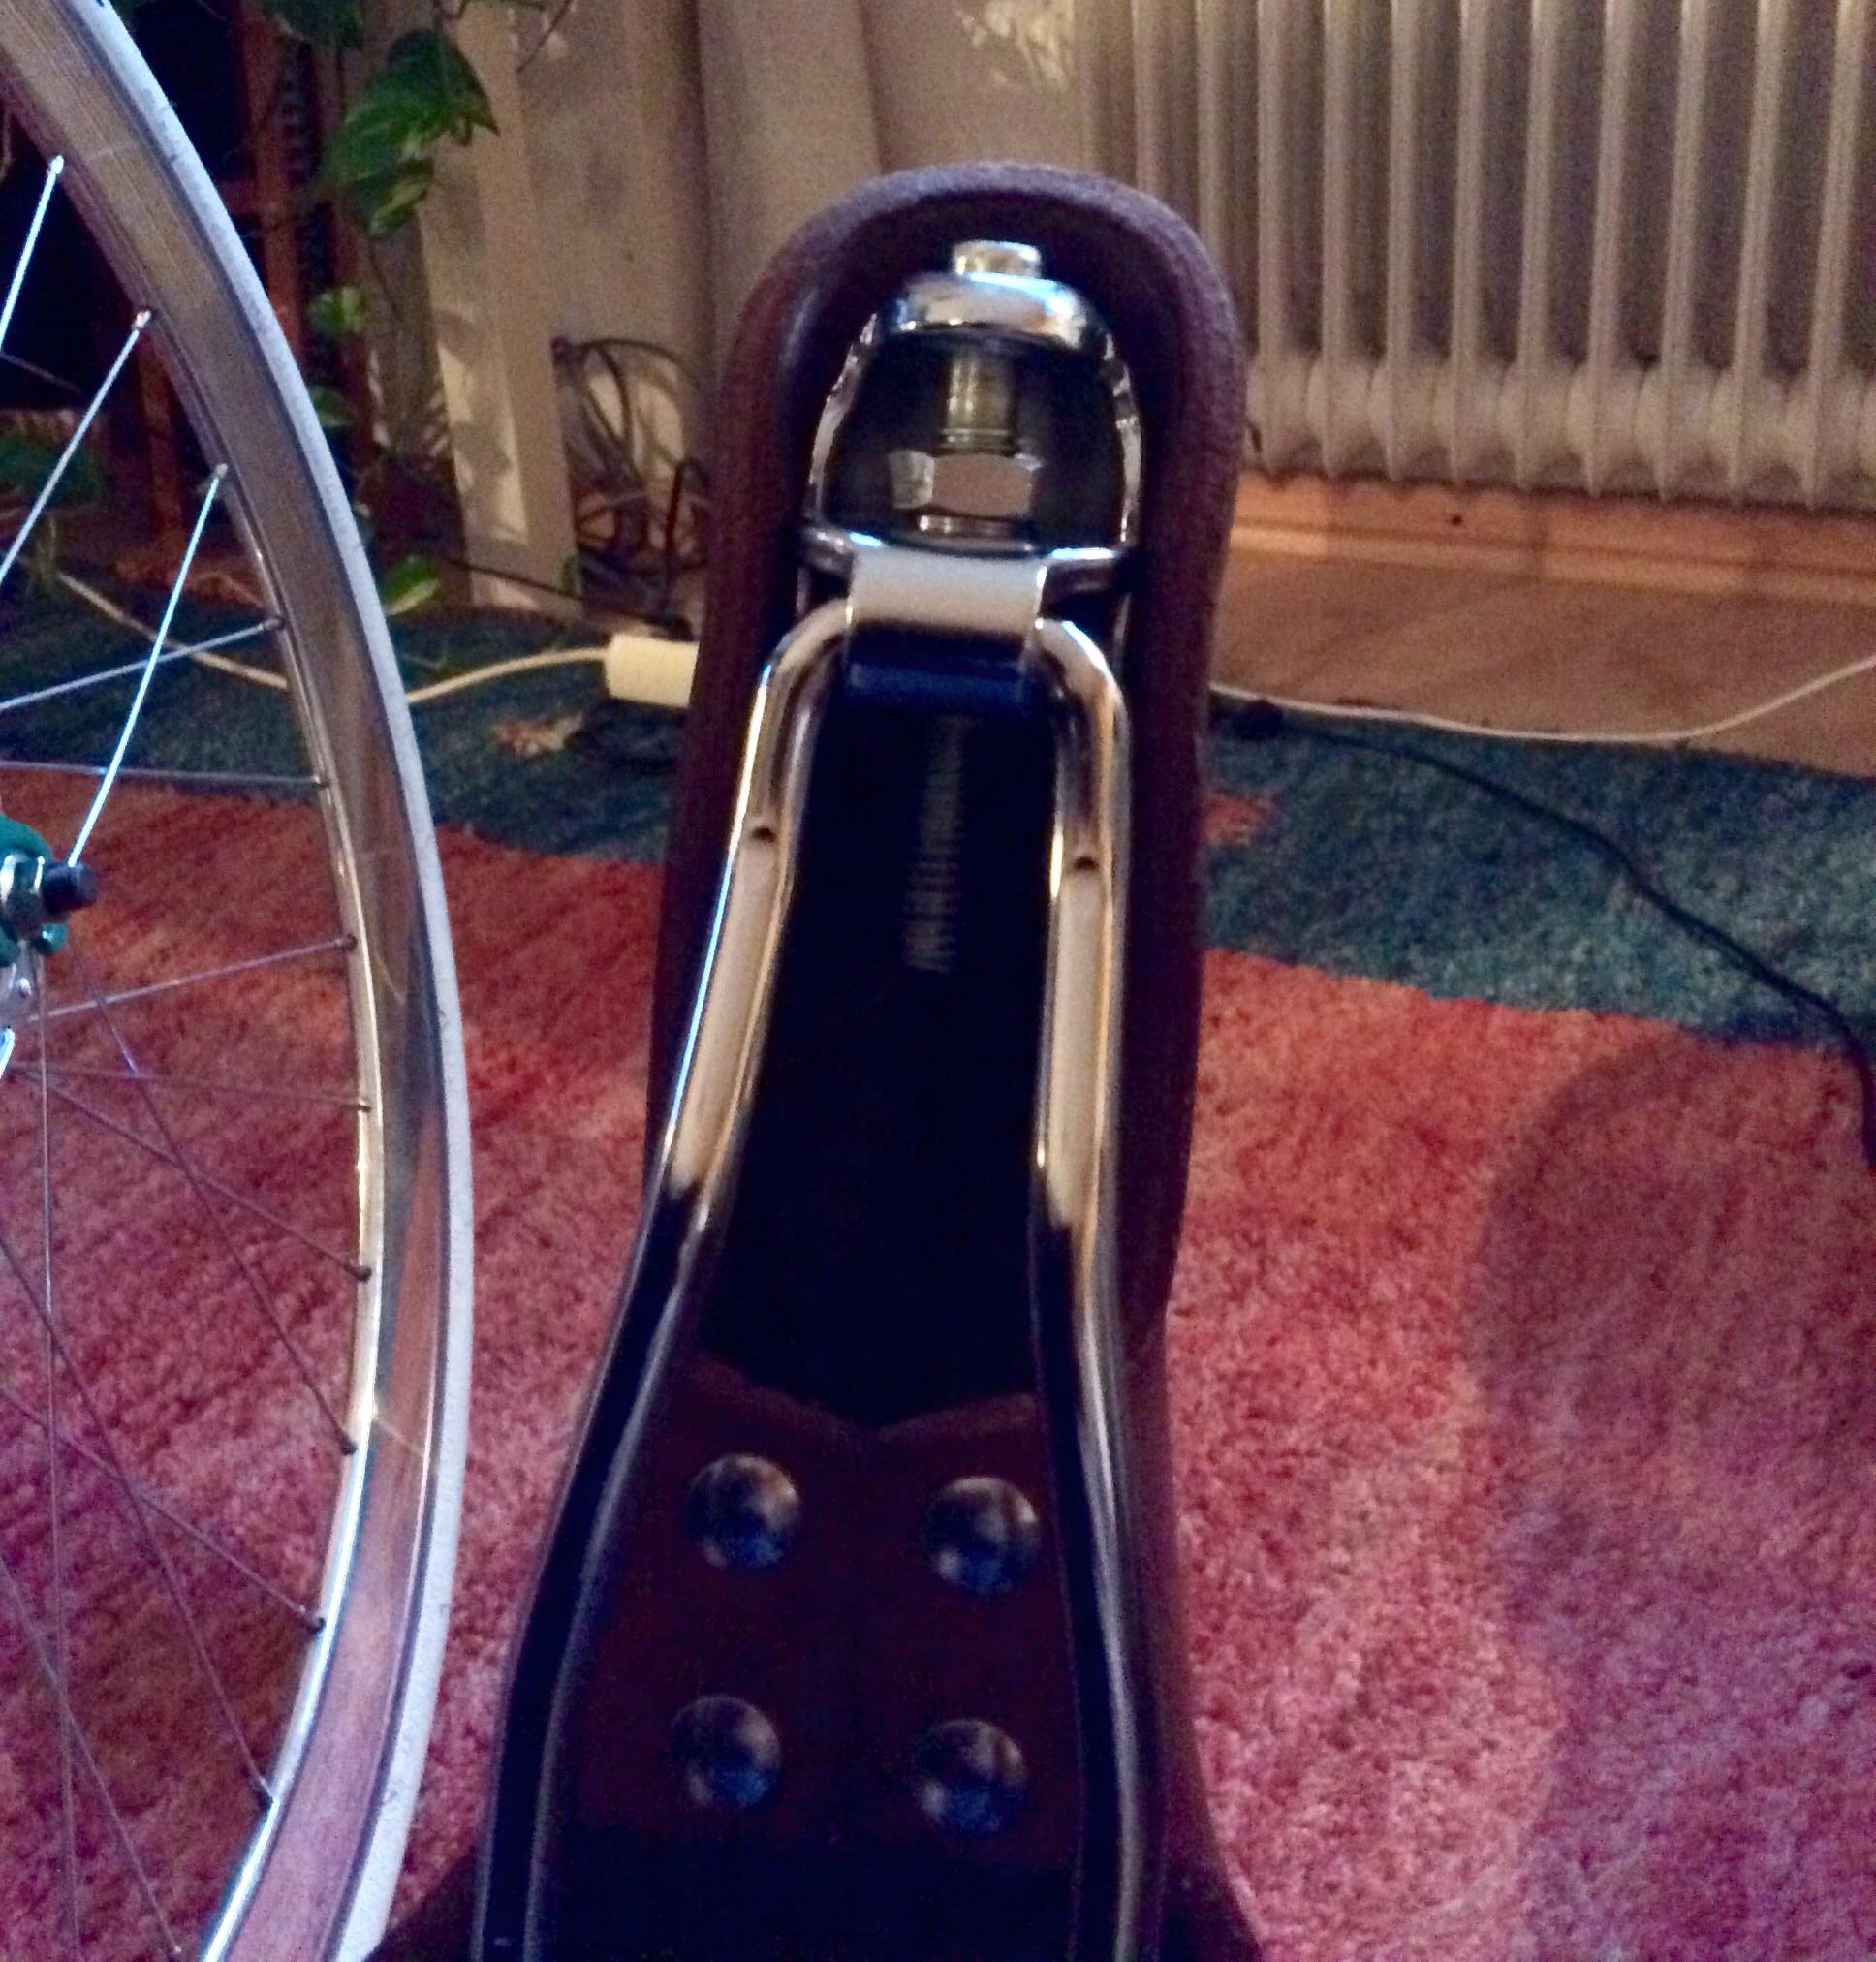 fahrradsattel richtig einstellen fahrrad sattel. Black Bedroom Furniture Sets. Home Design Ideas